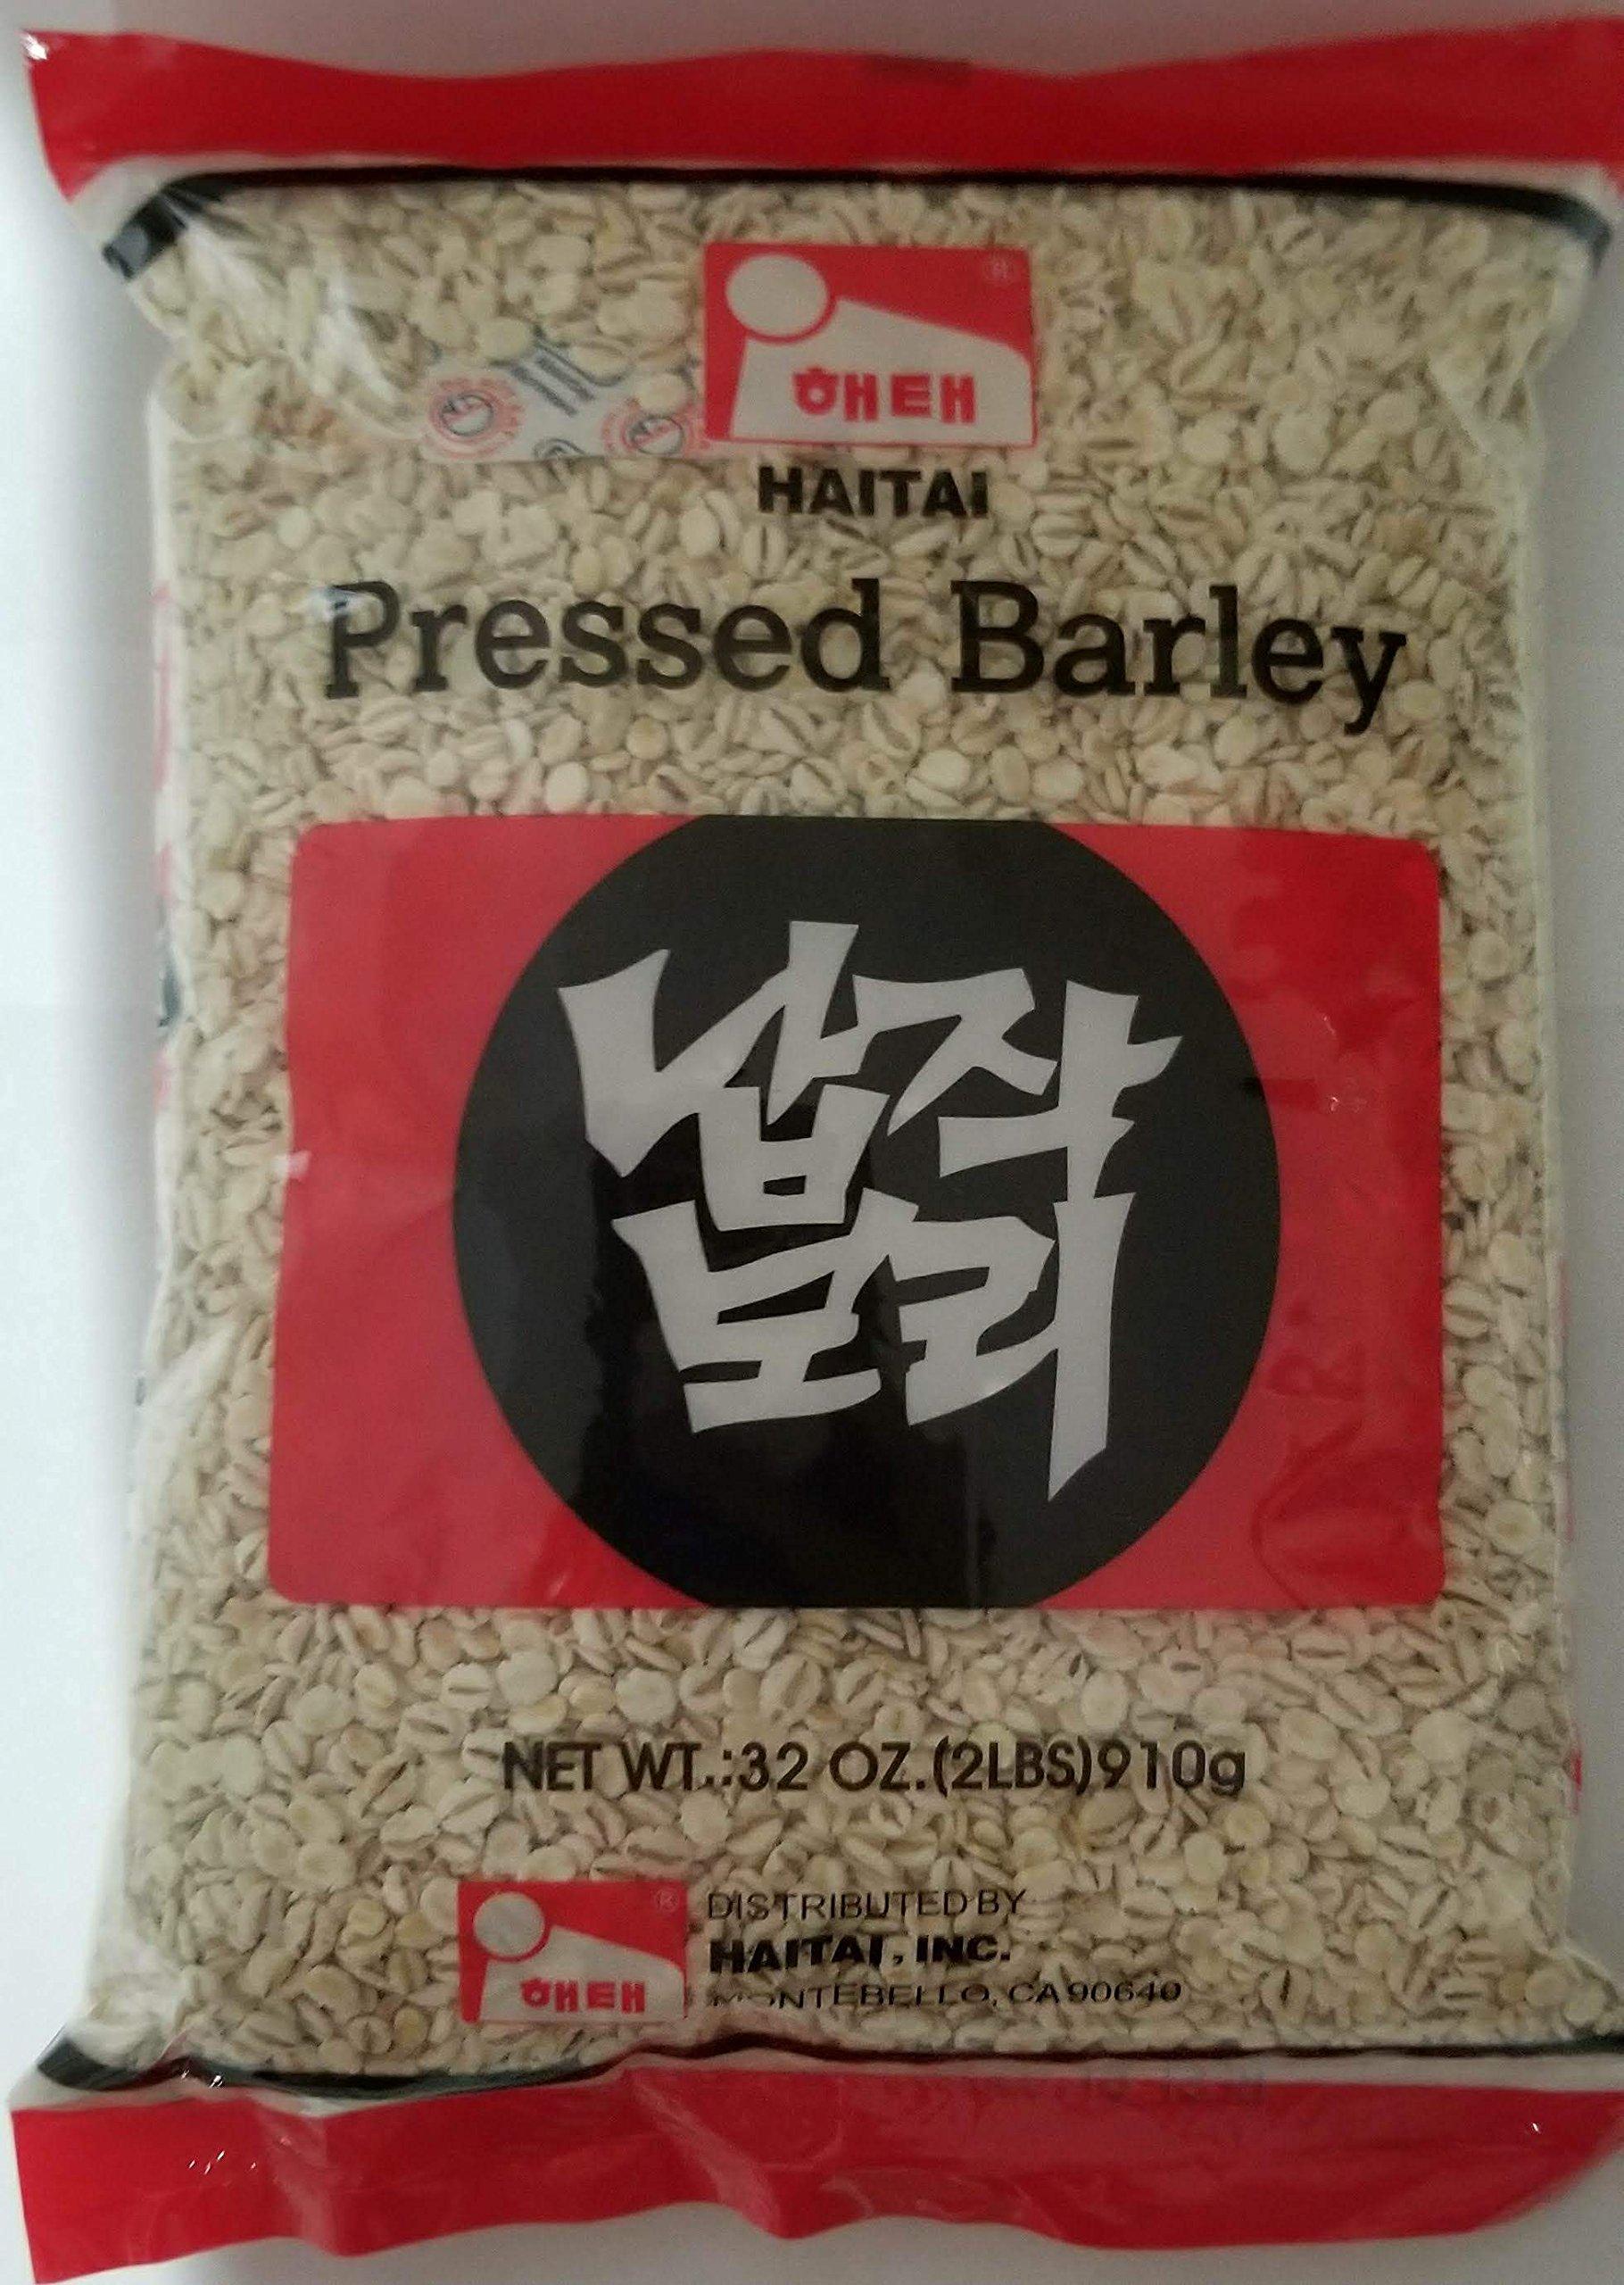 Haitai Pressed Barley X 3